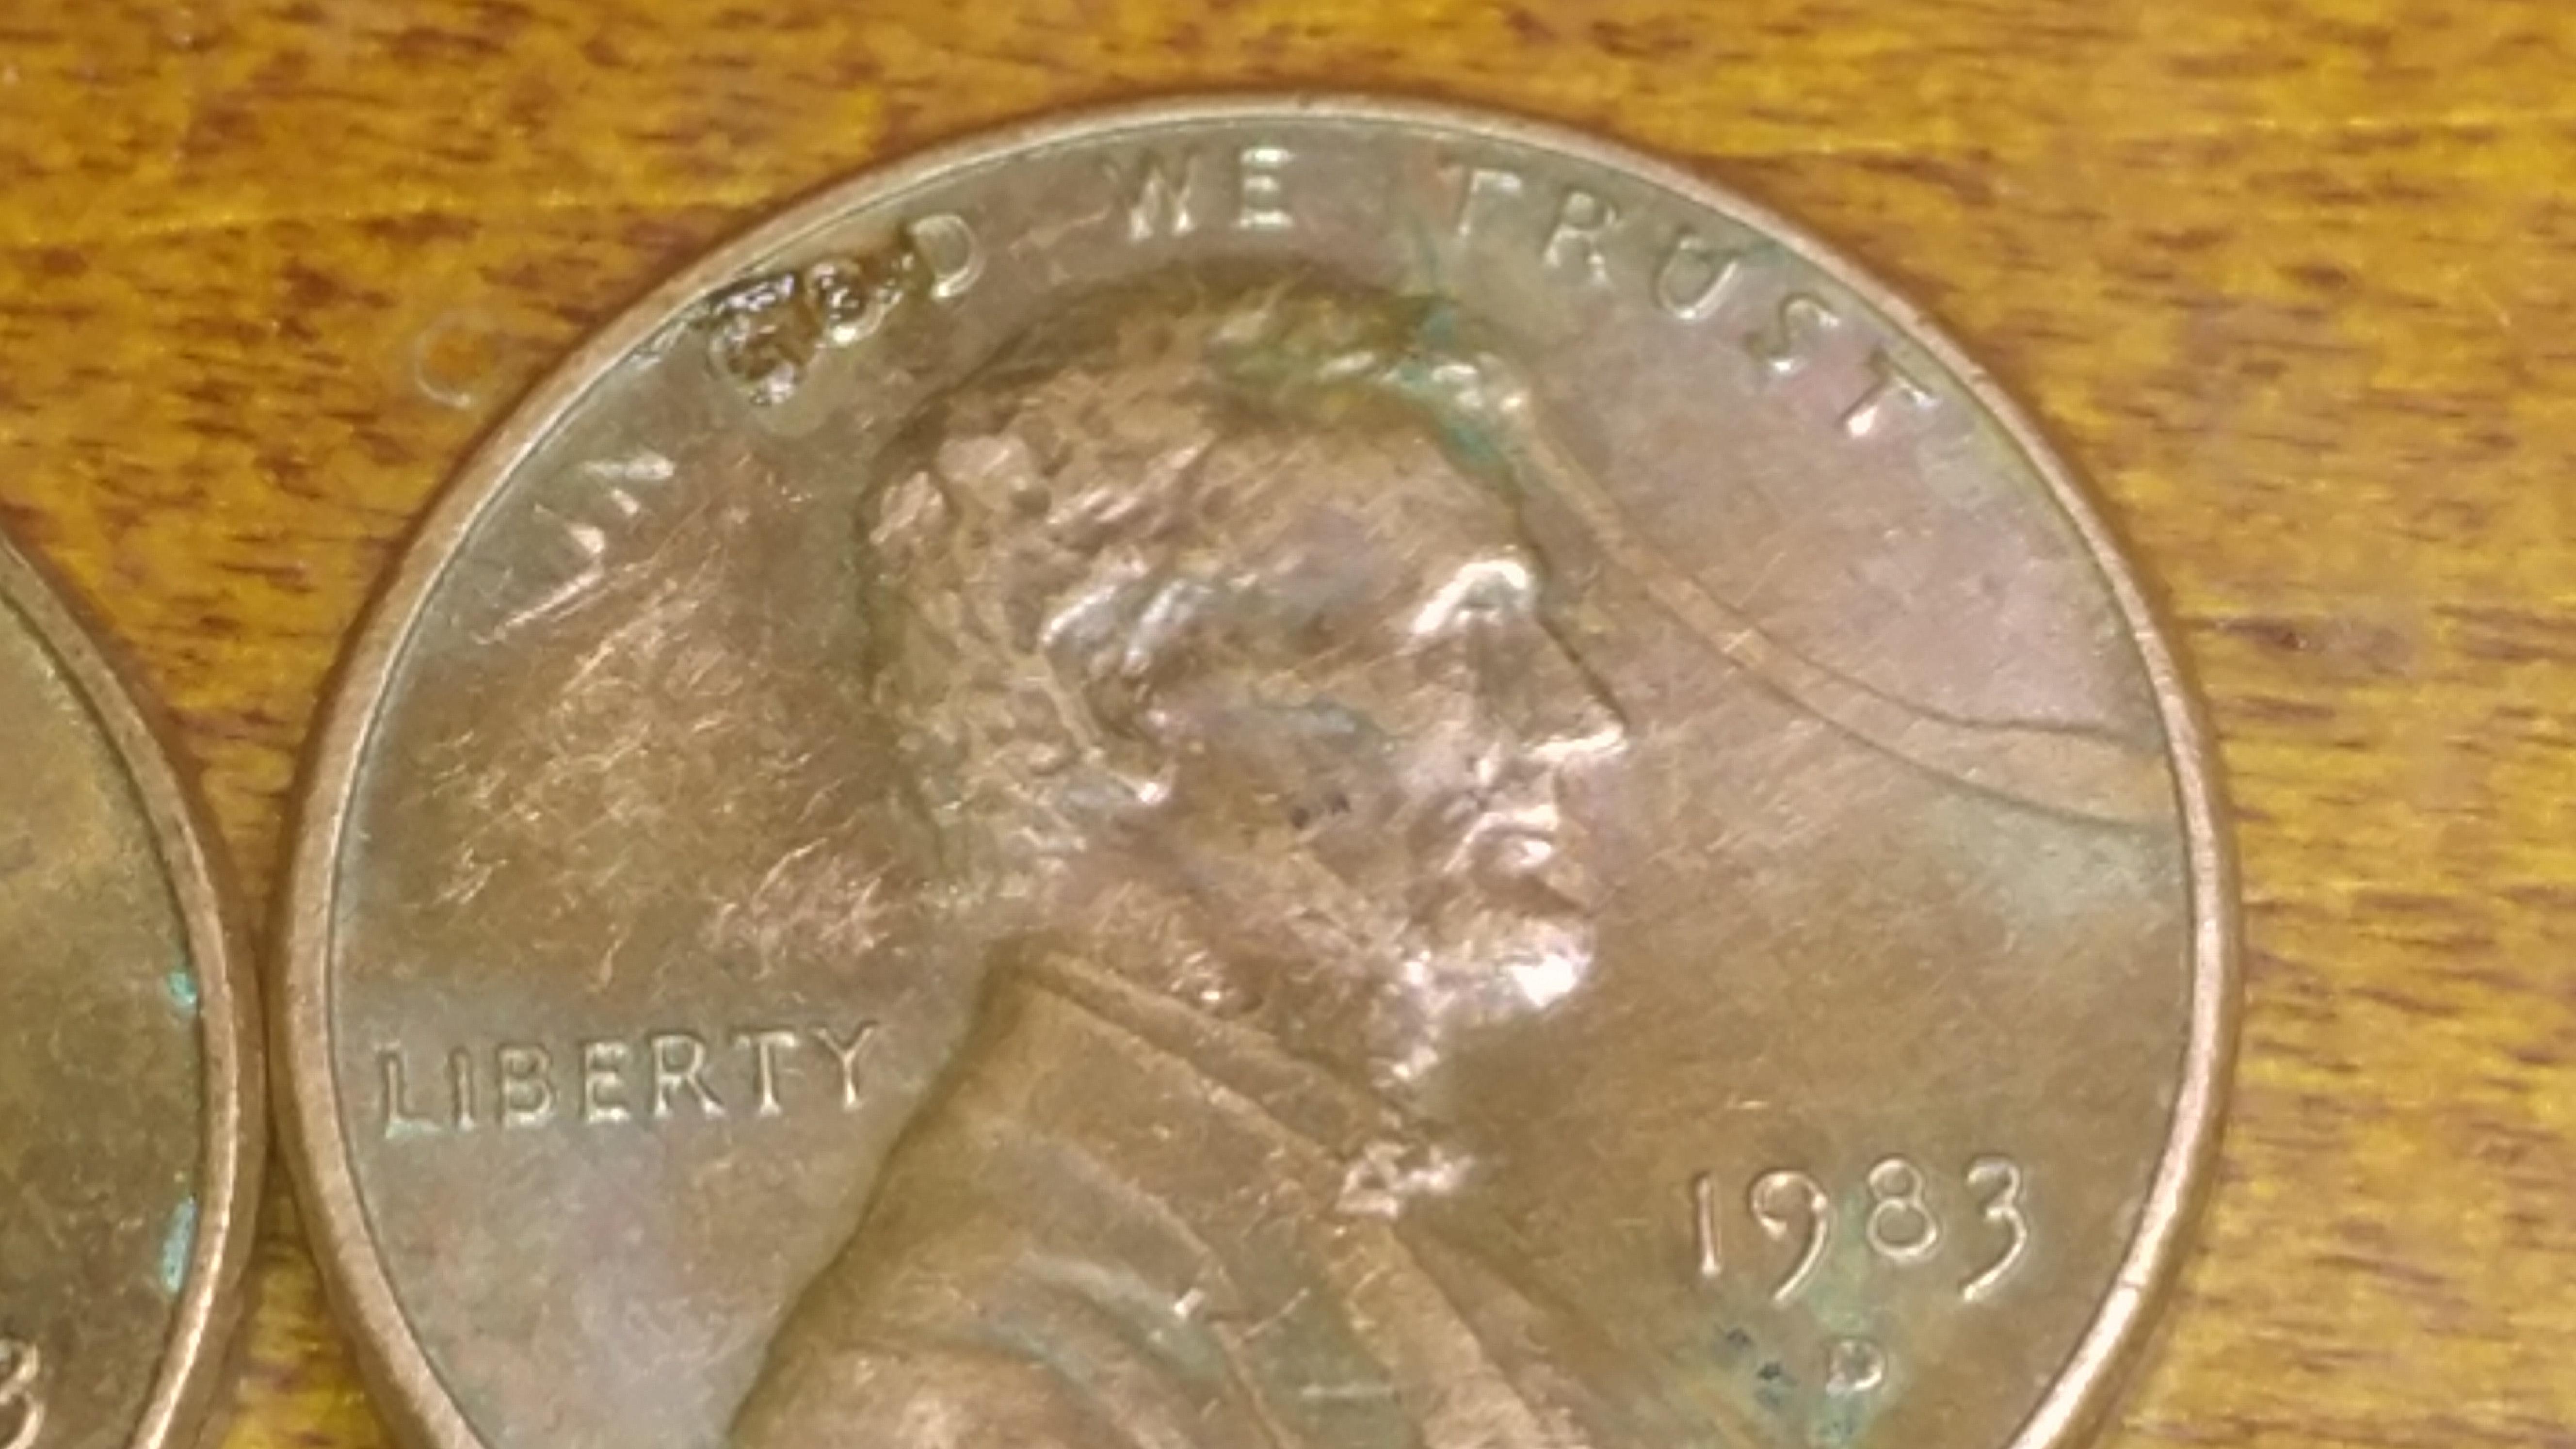 Ntk coin worth list - Smnx coin design ideas